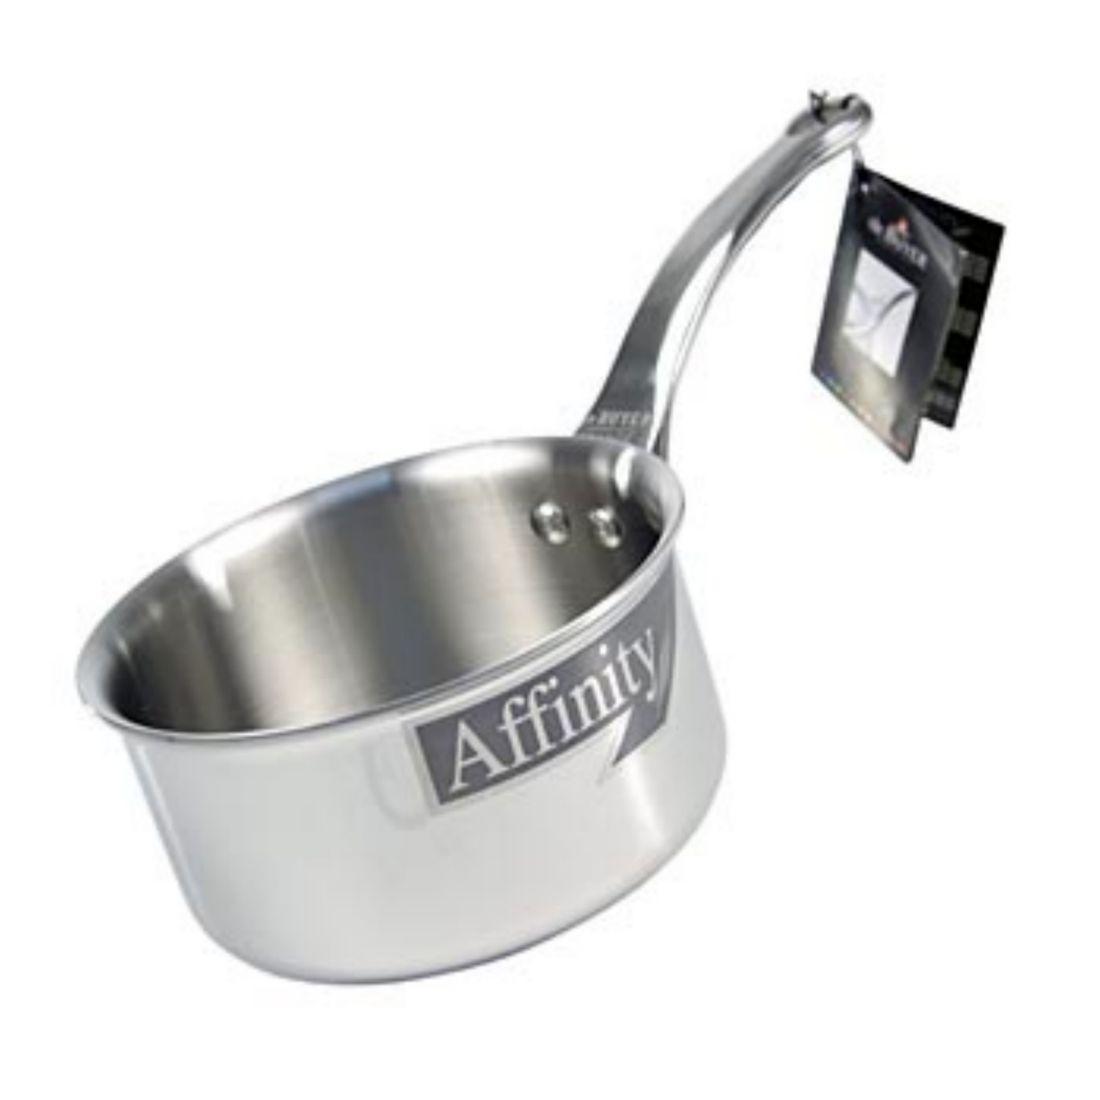 Rendlík Affinity 3,4 l